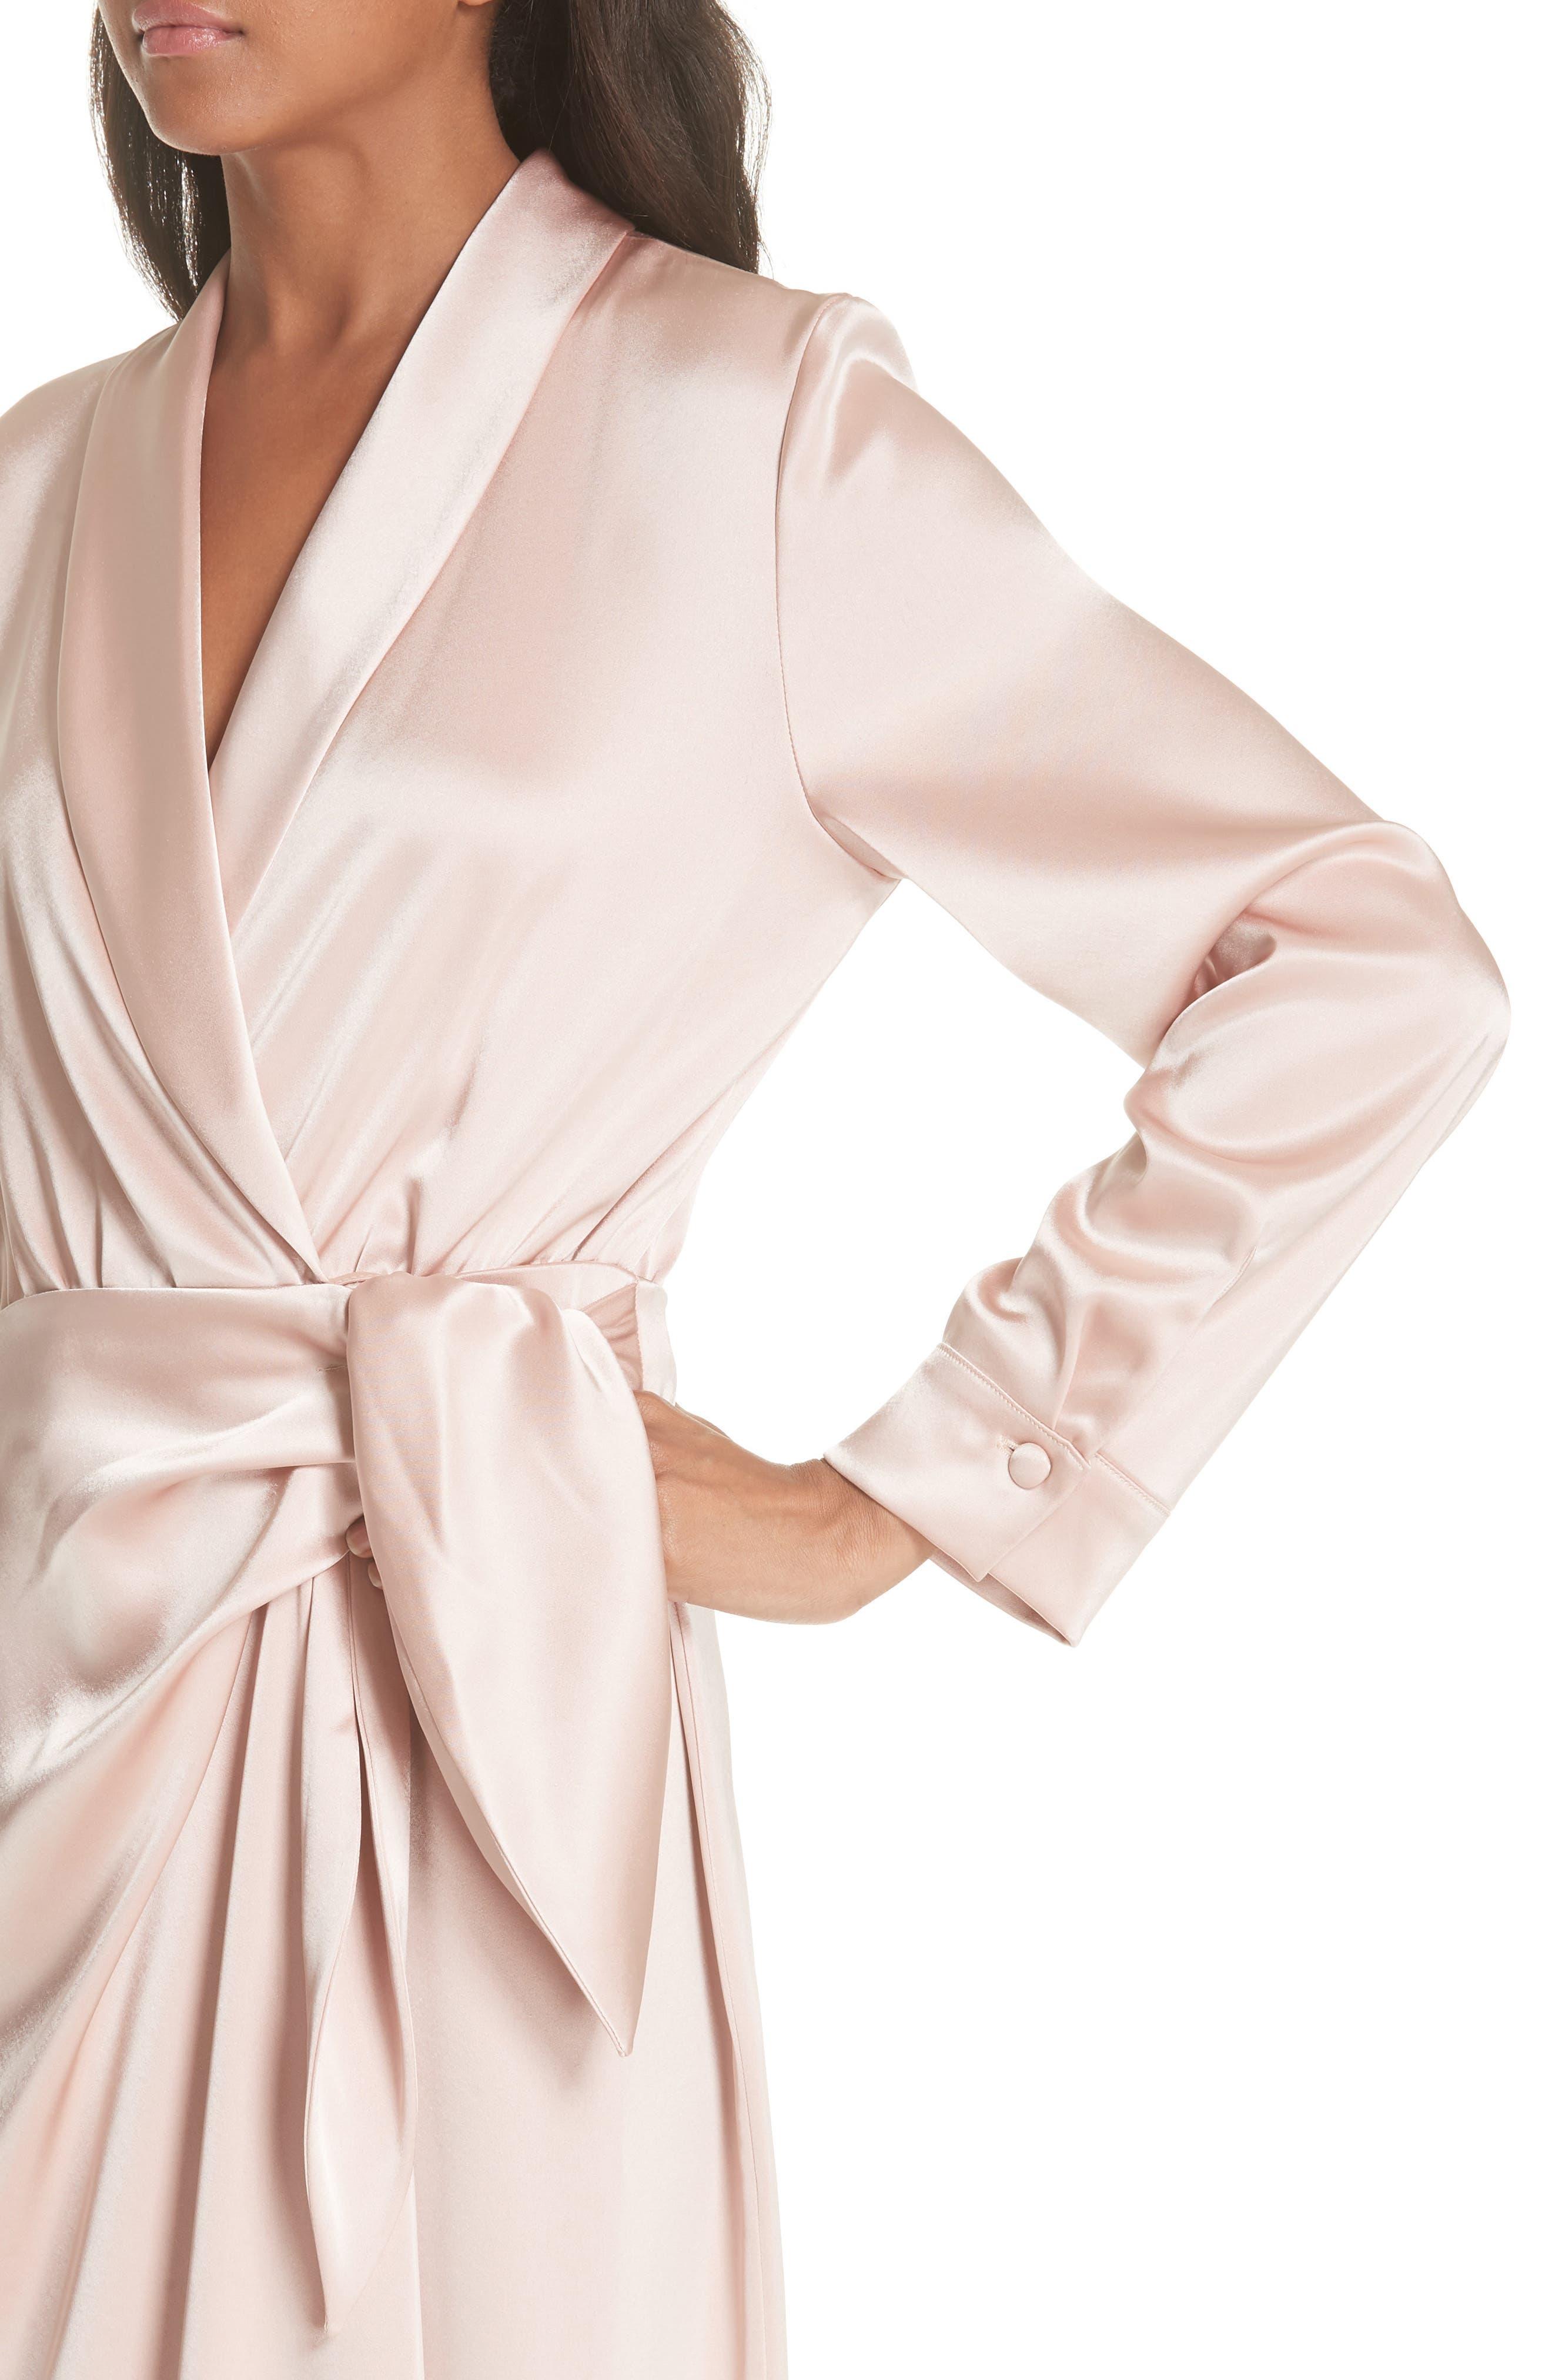 Ezra Satin Wrap Dress,                             Alternate thumbnail 4, color,                             650